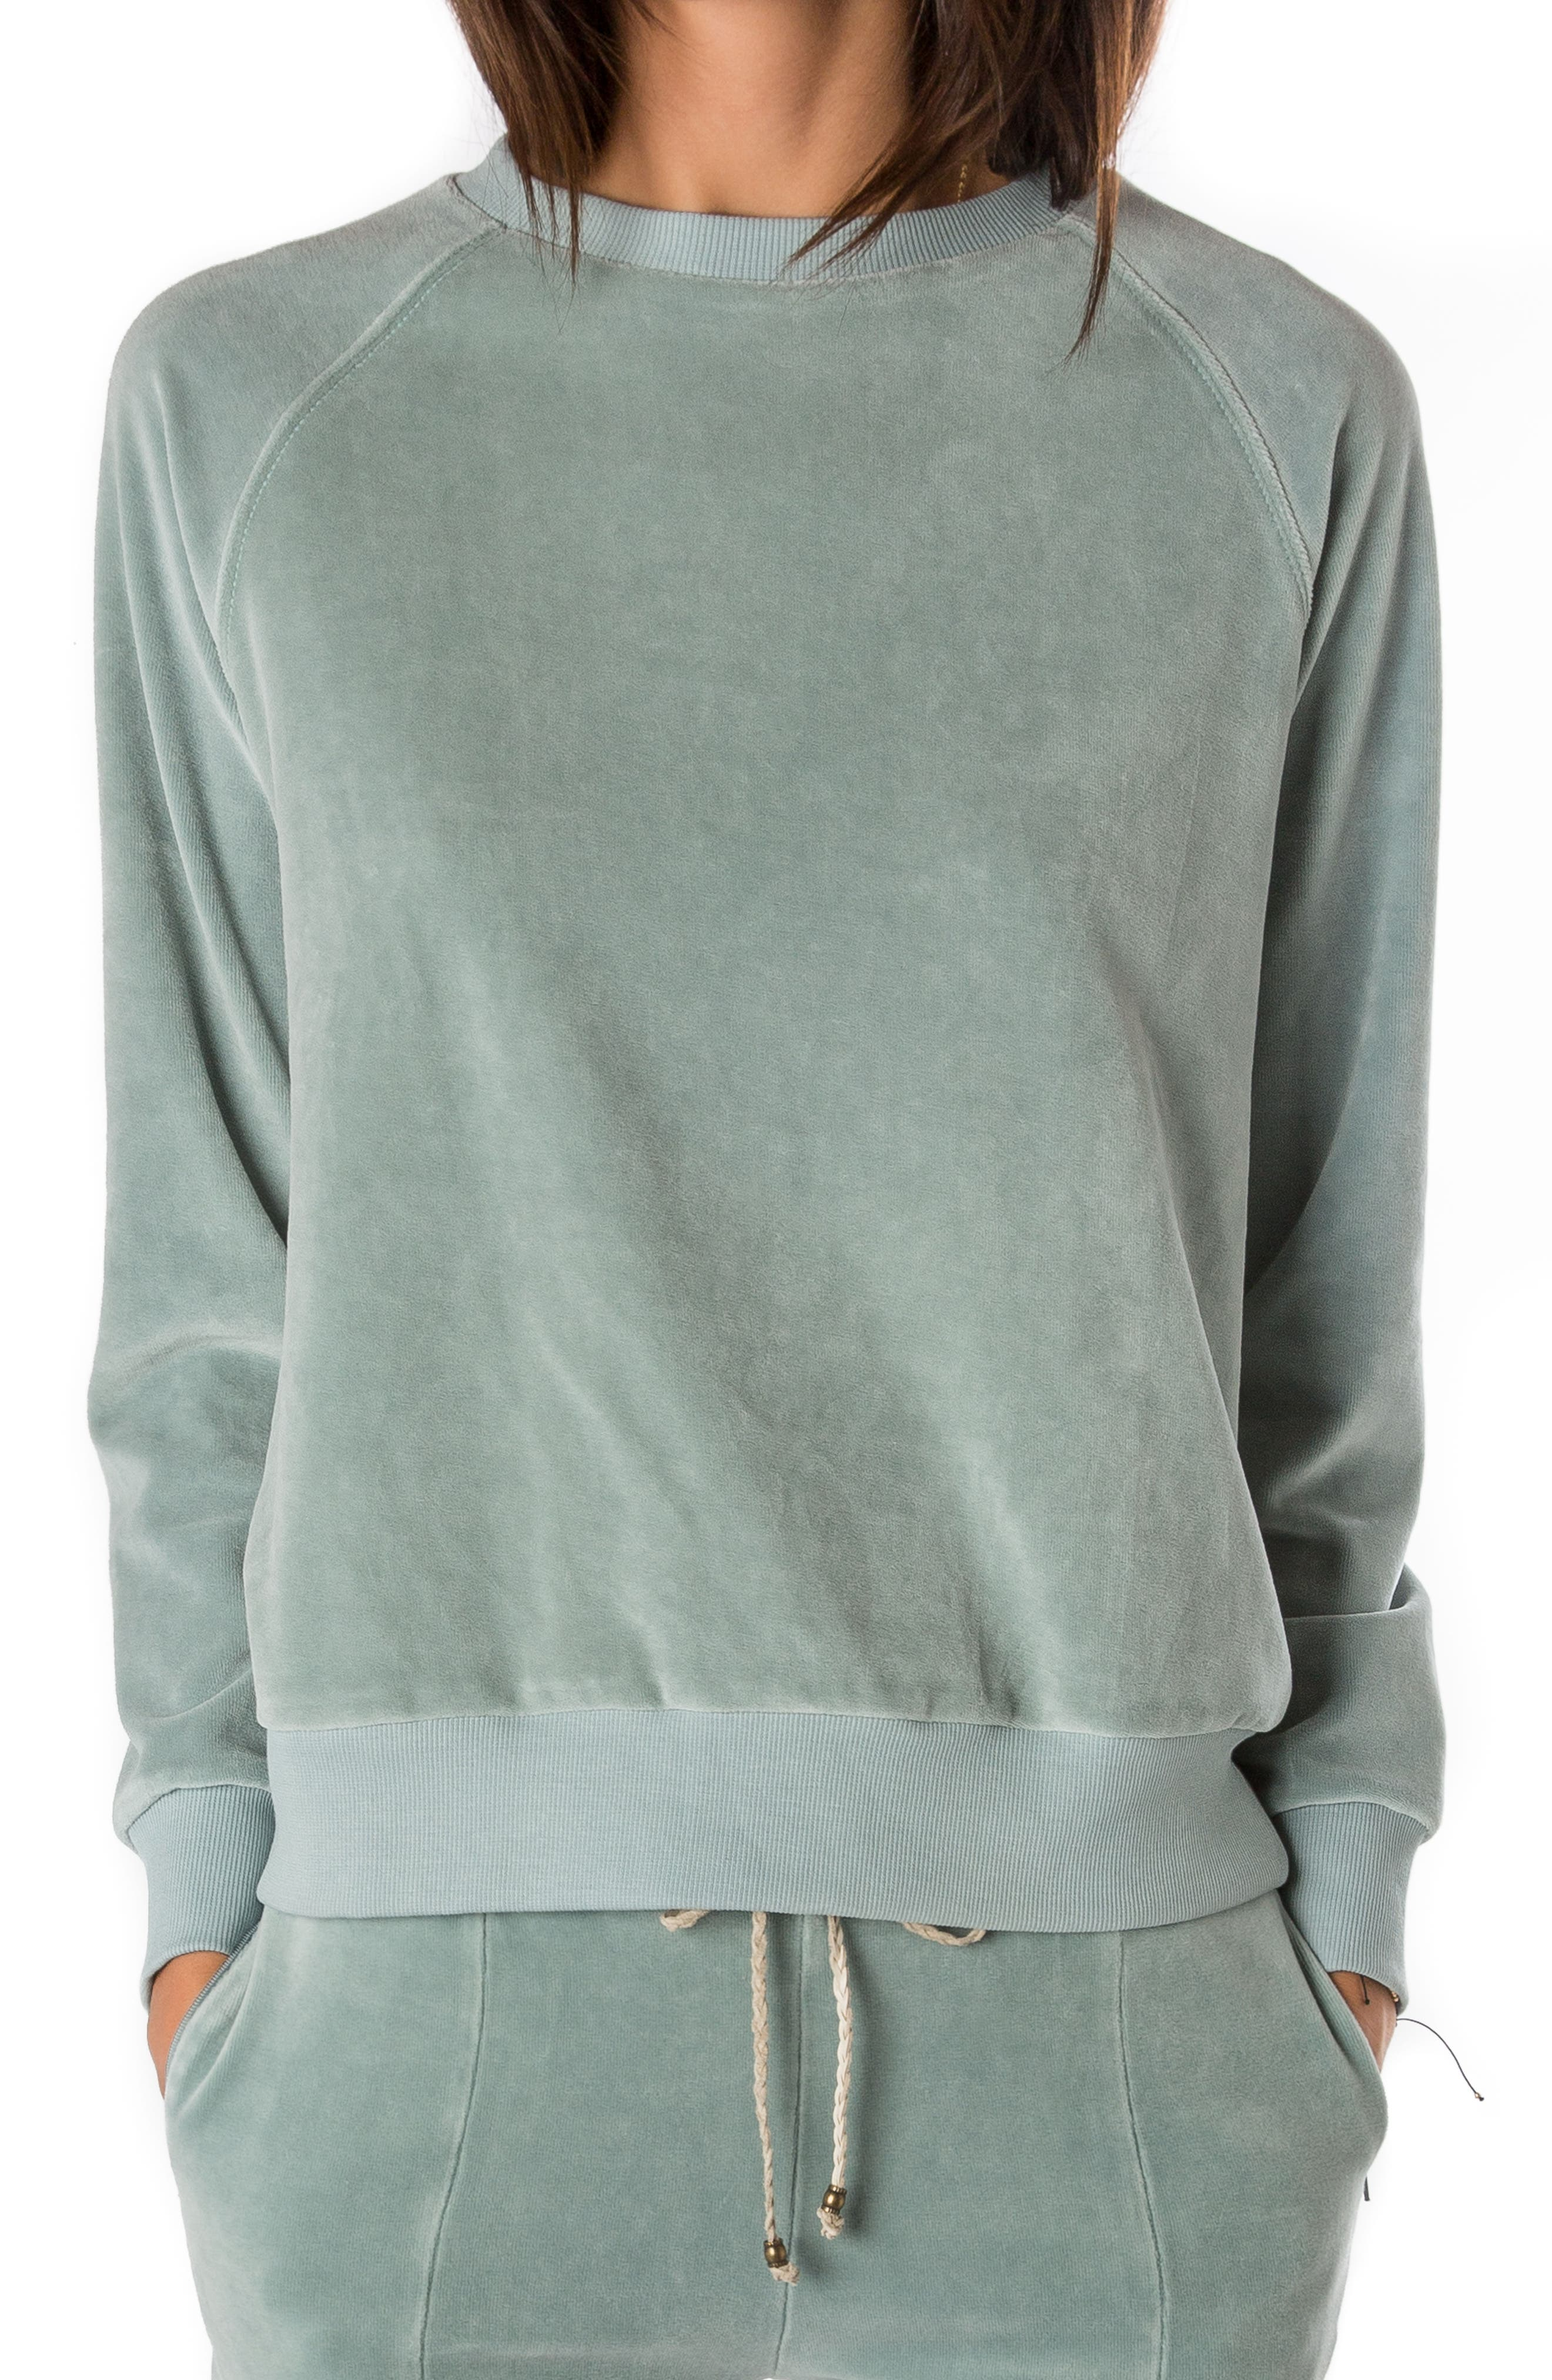 Velour Sweatshirt,                             Main thumbnail 1, color,                             400